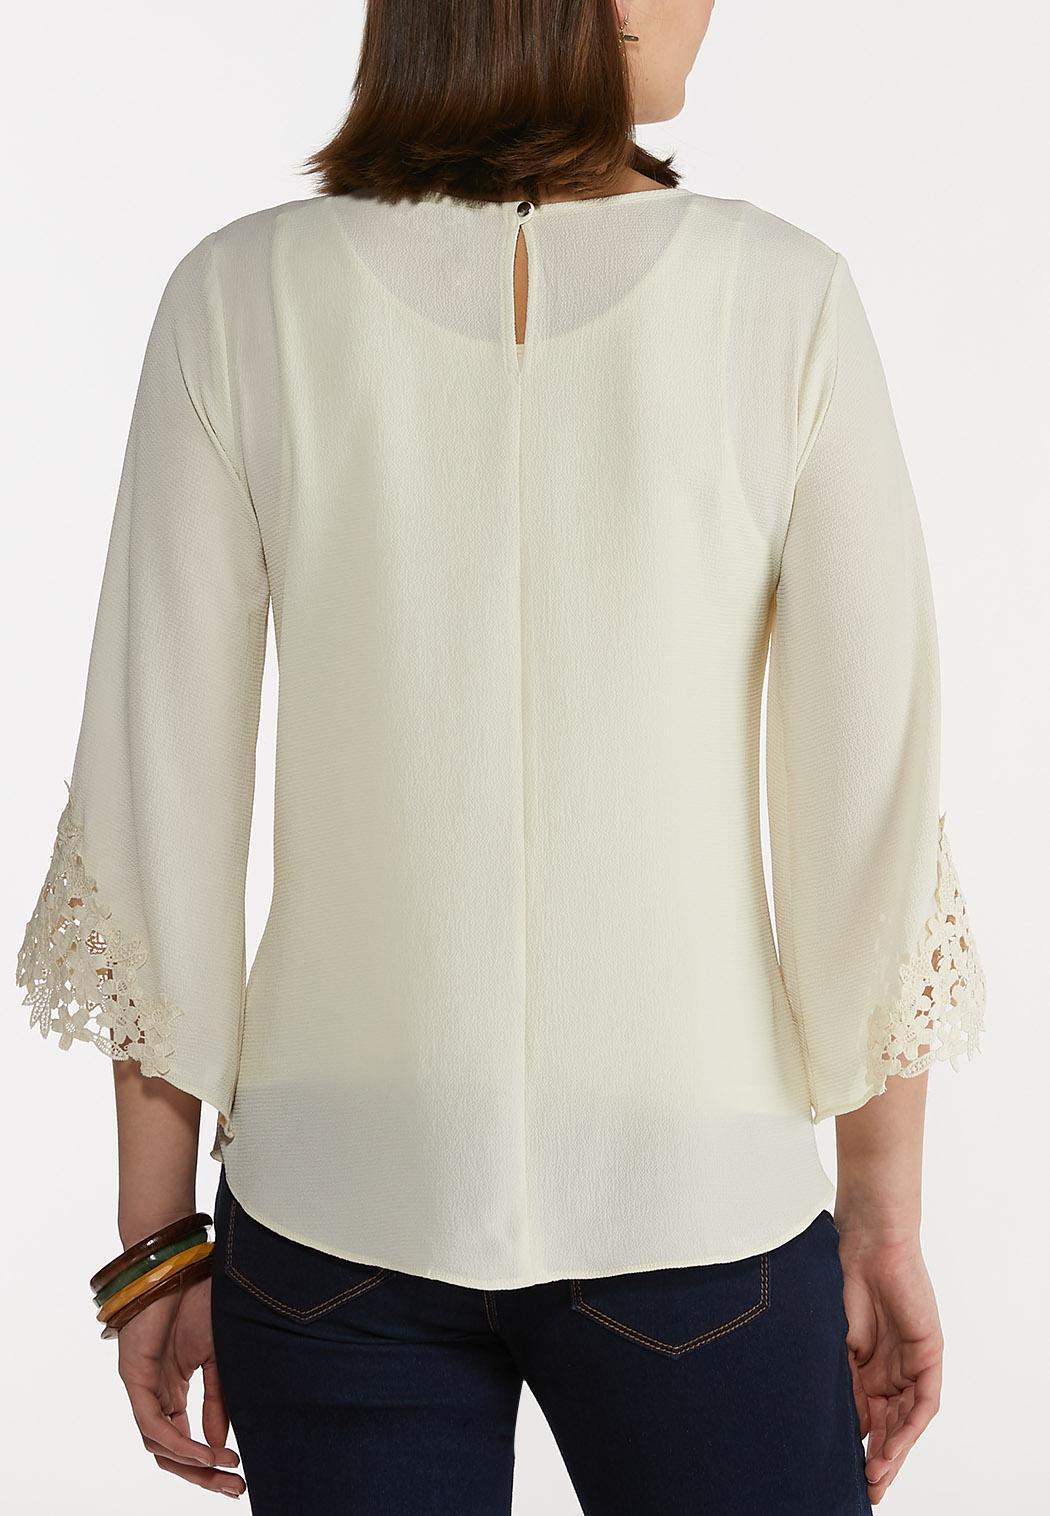 Crepe Floral Lace Trimmed Top (Item #44246441)